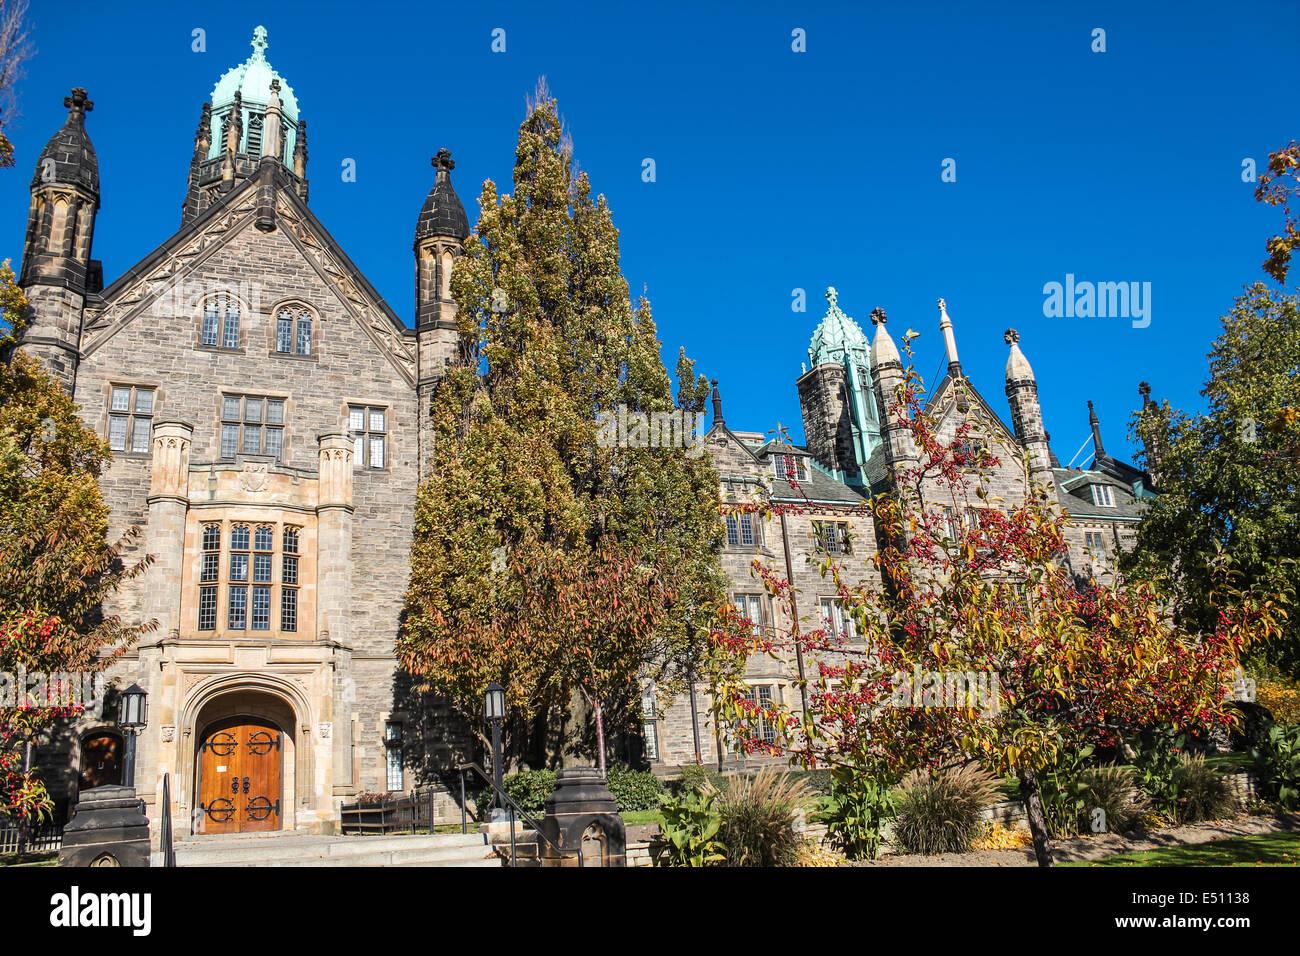 Trinity College at University of Toronto - Stock Image